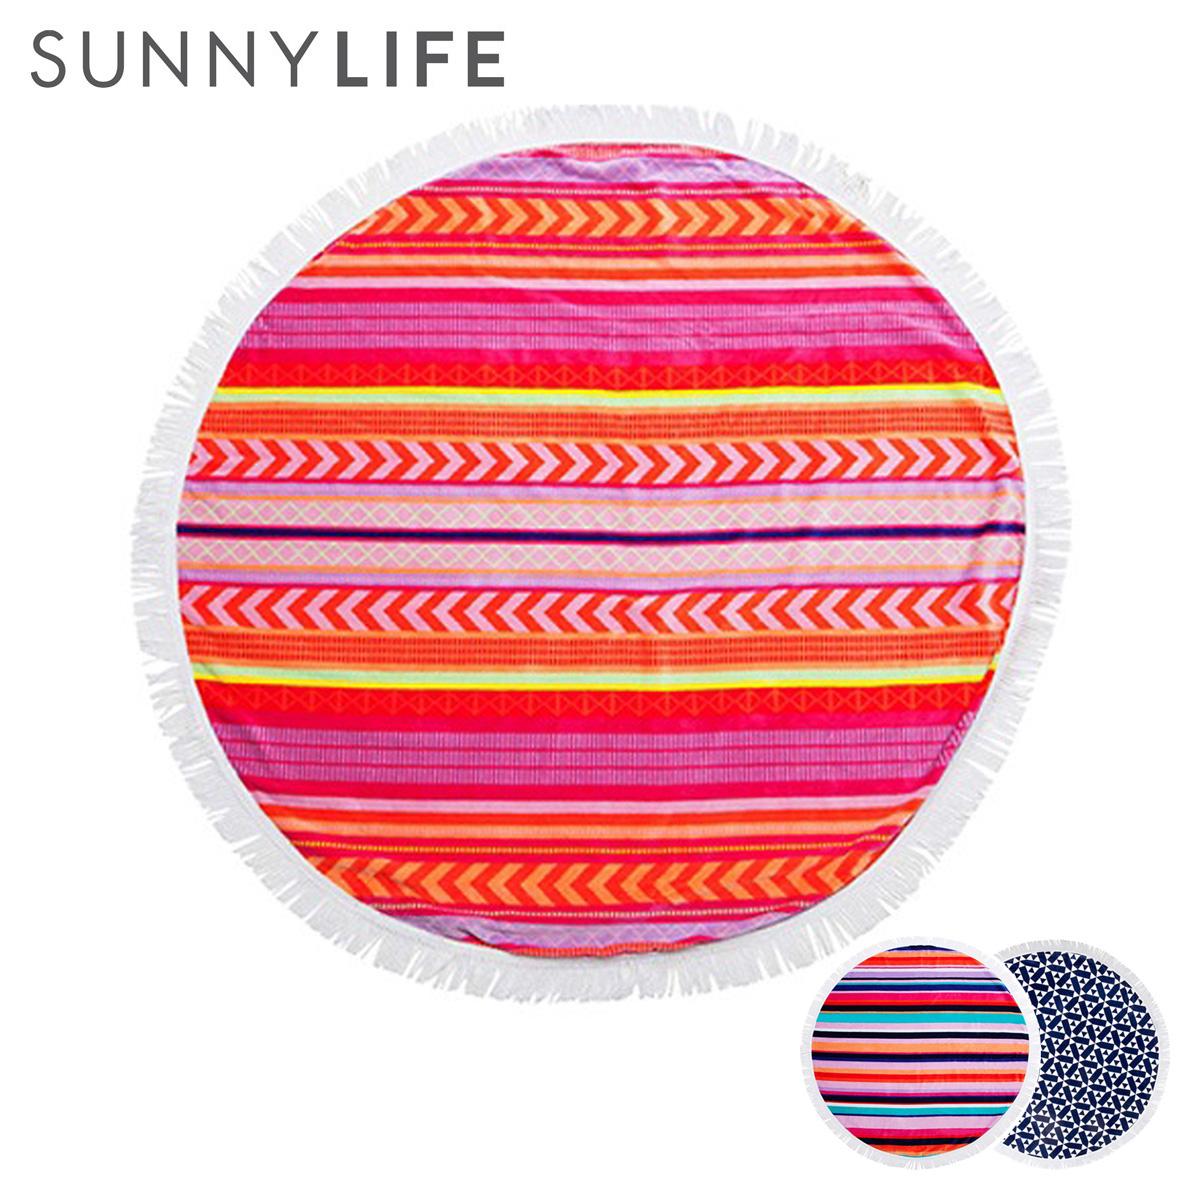 SUNNYLIFE サニーライフ ラウンドビーチタオル ビーチマット タオル ラウンド バスタオル タオルケット 大判 SUNNY LIFE Round Towel 3カラー